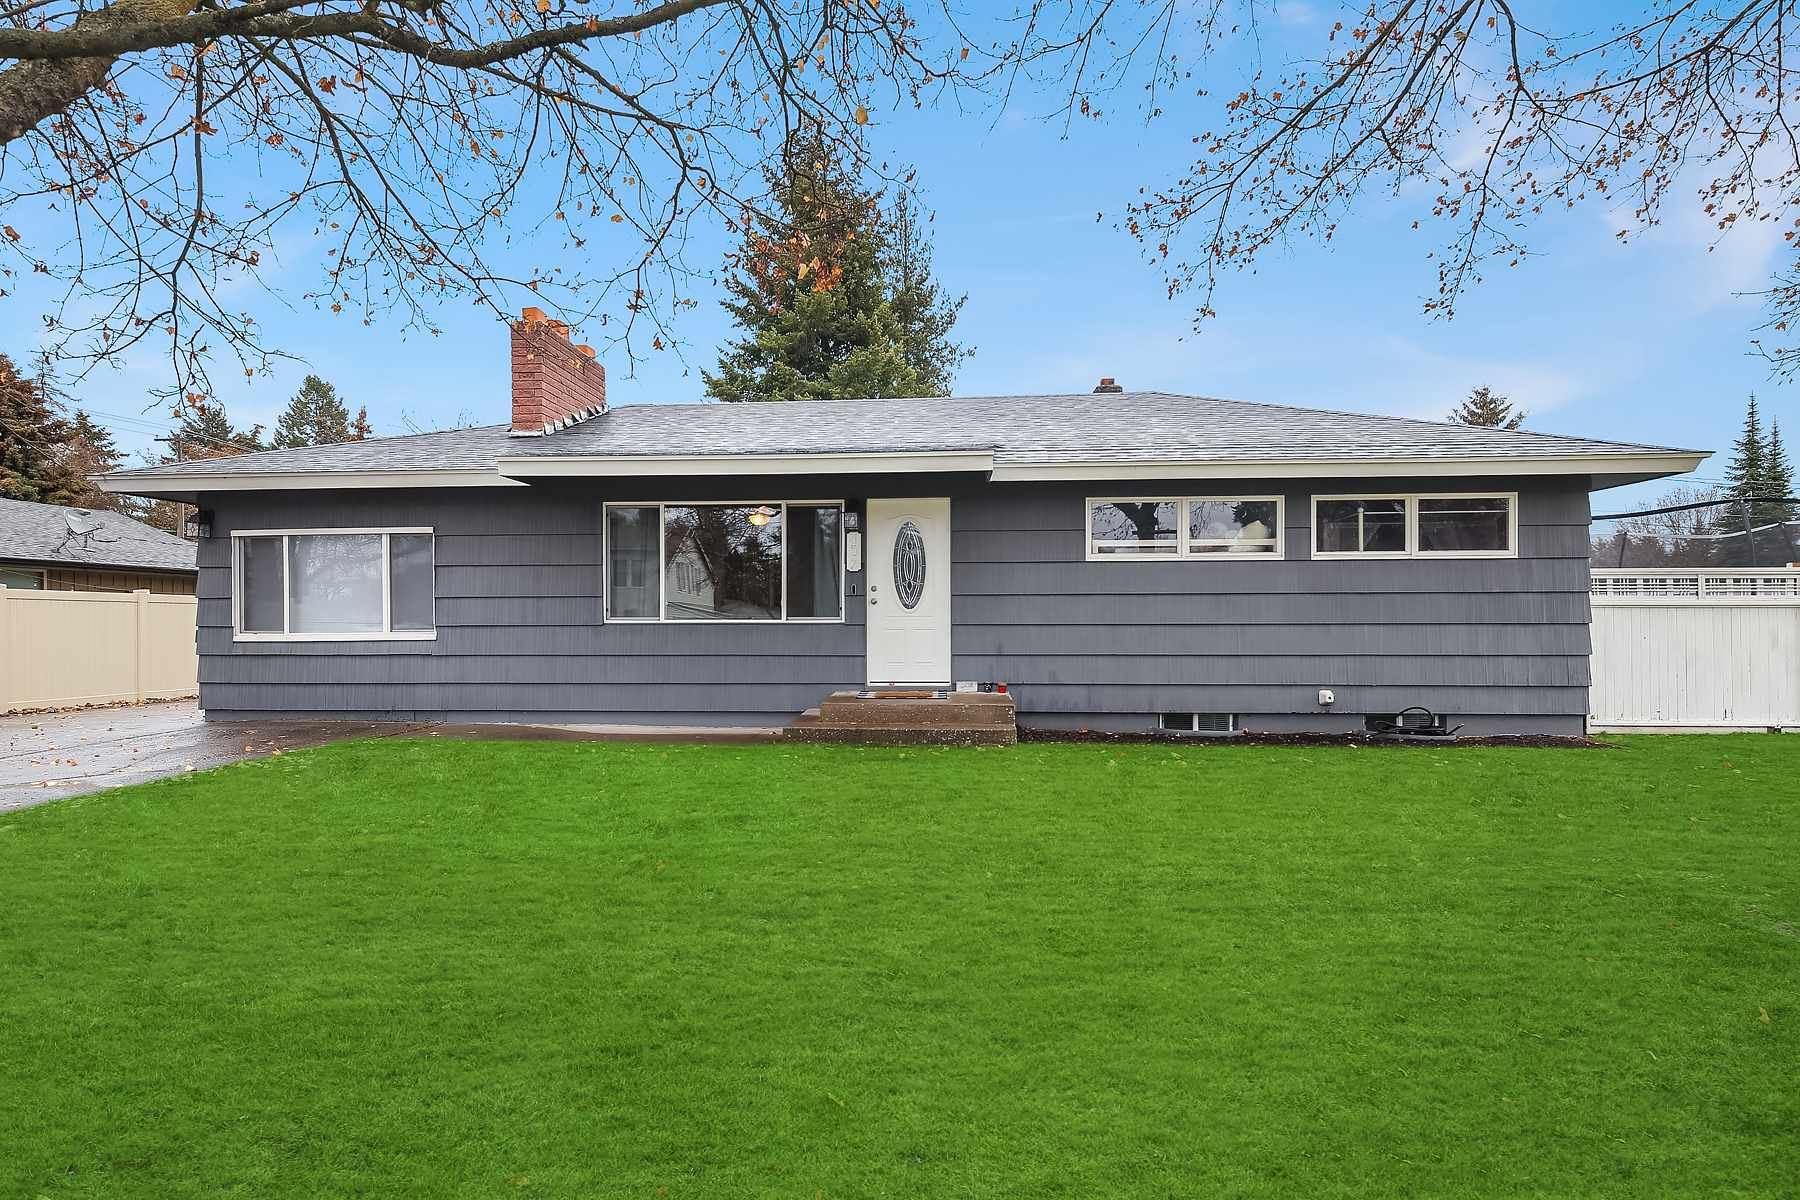 407 S Fox Rd, Spokane Valley, WA 99206 - #: 202025432